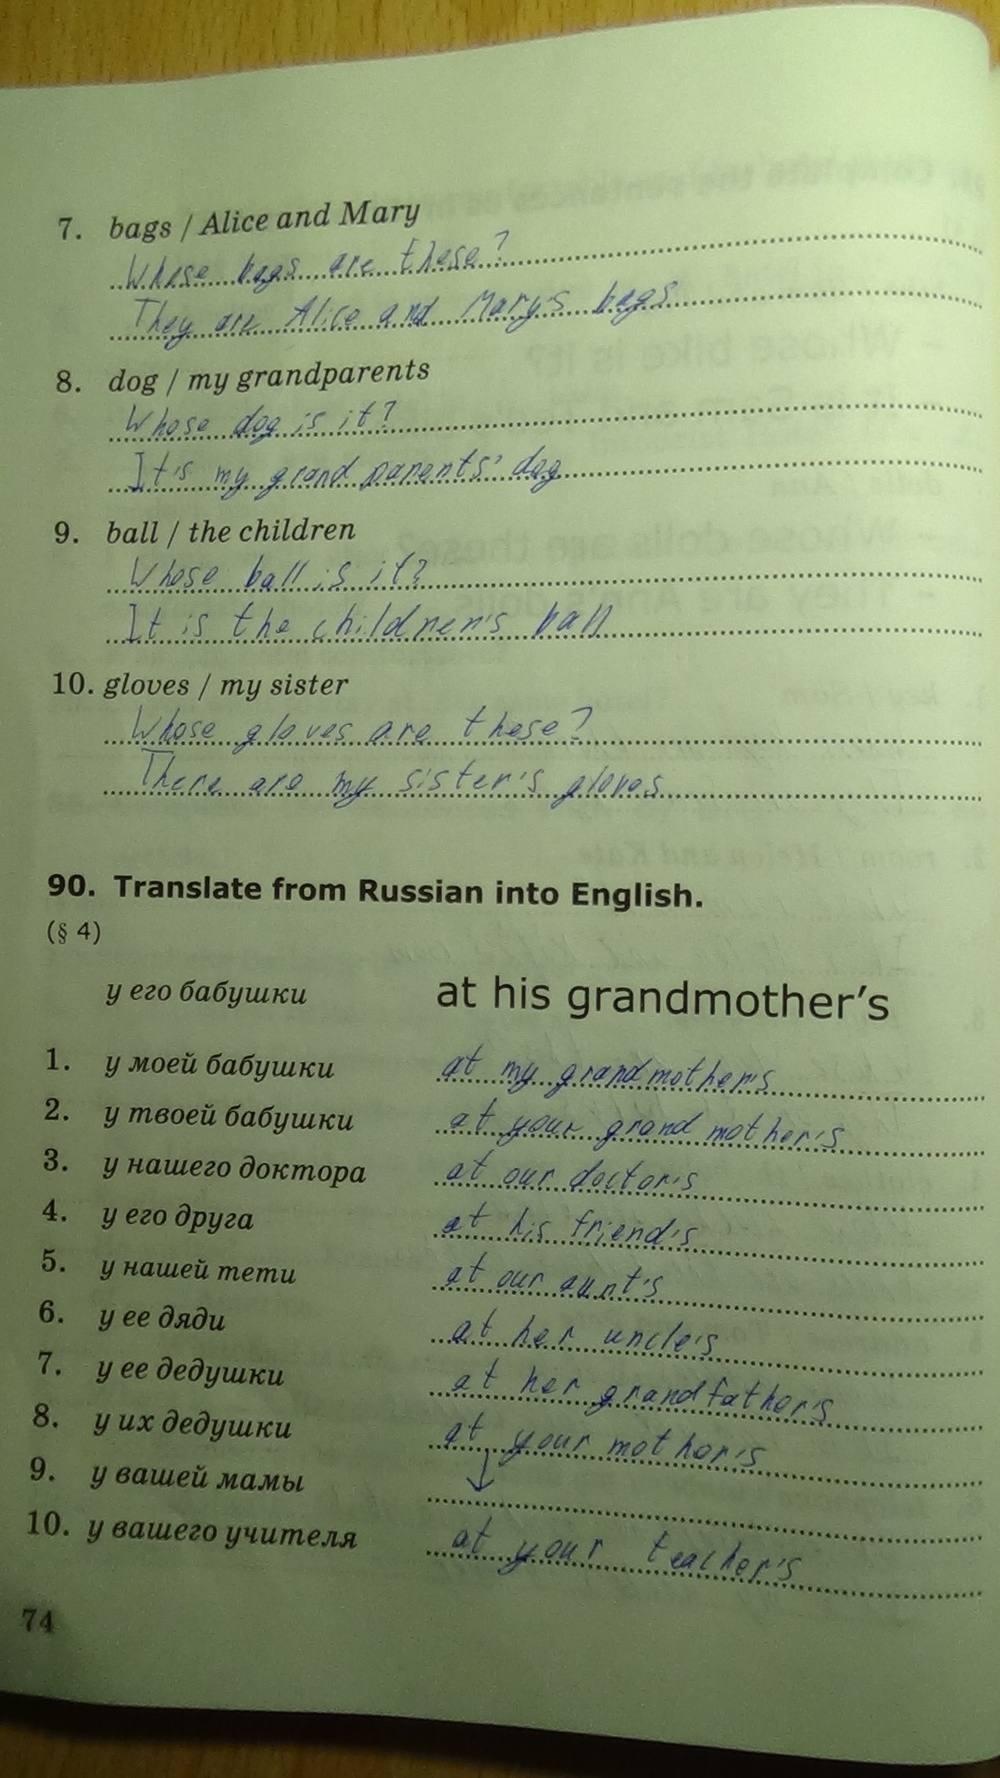 Сборник старлайт грамматический гдз 5